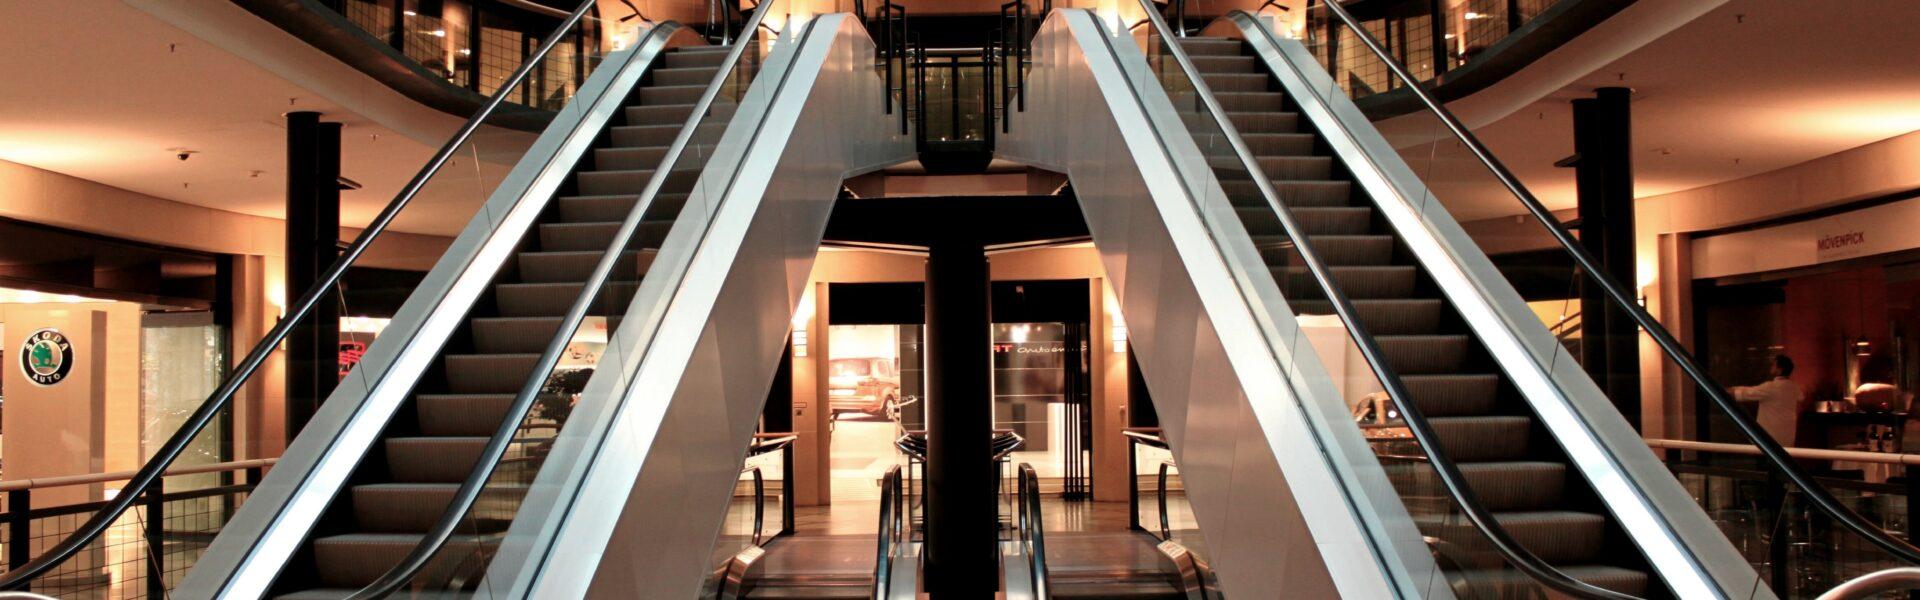 escalator, stairs, metal segments